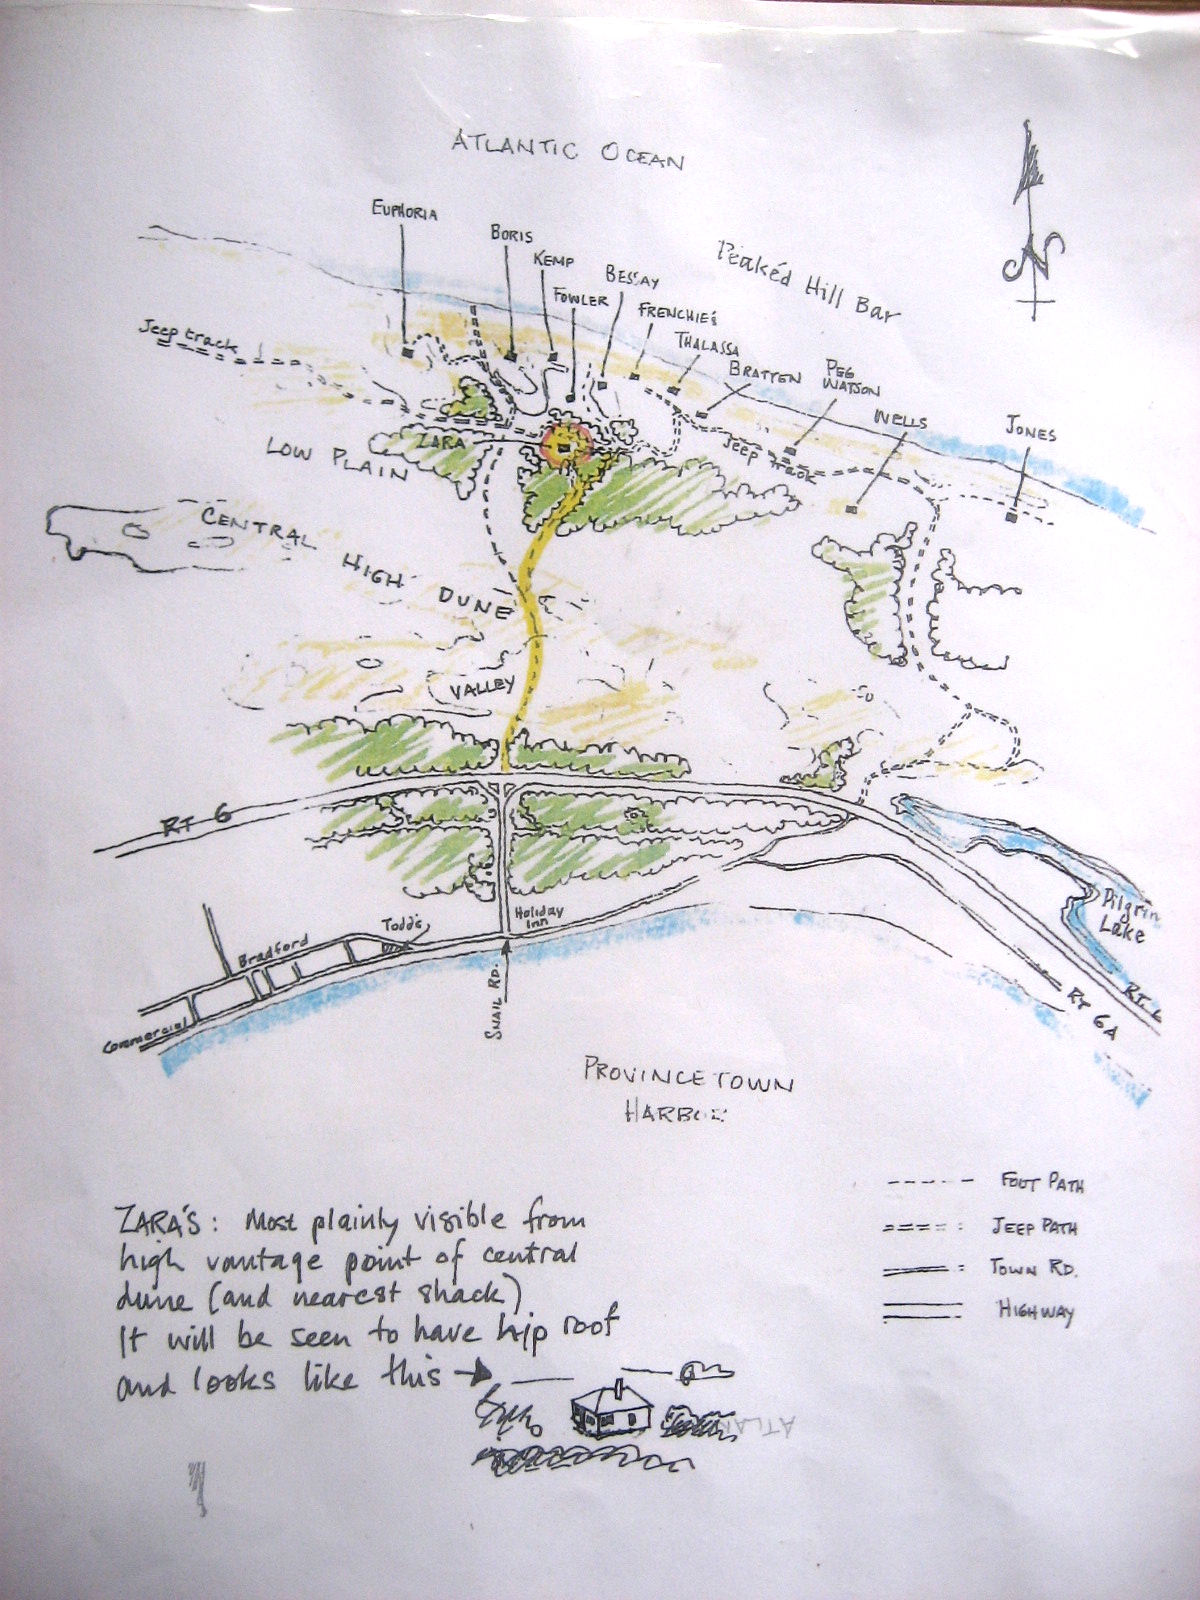 map of Peaked Hill Bars Trust historic dune shacks